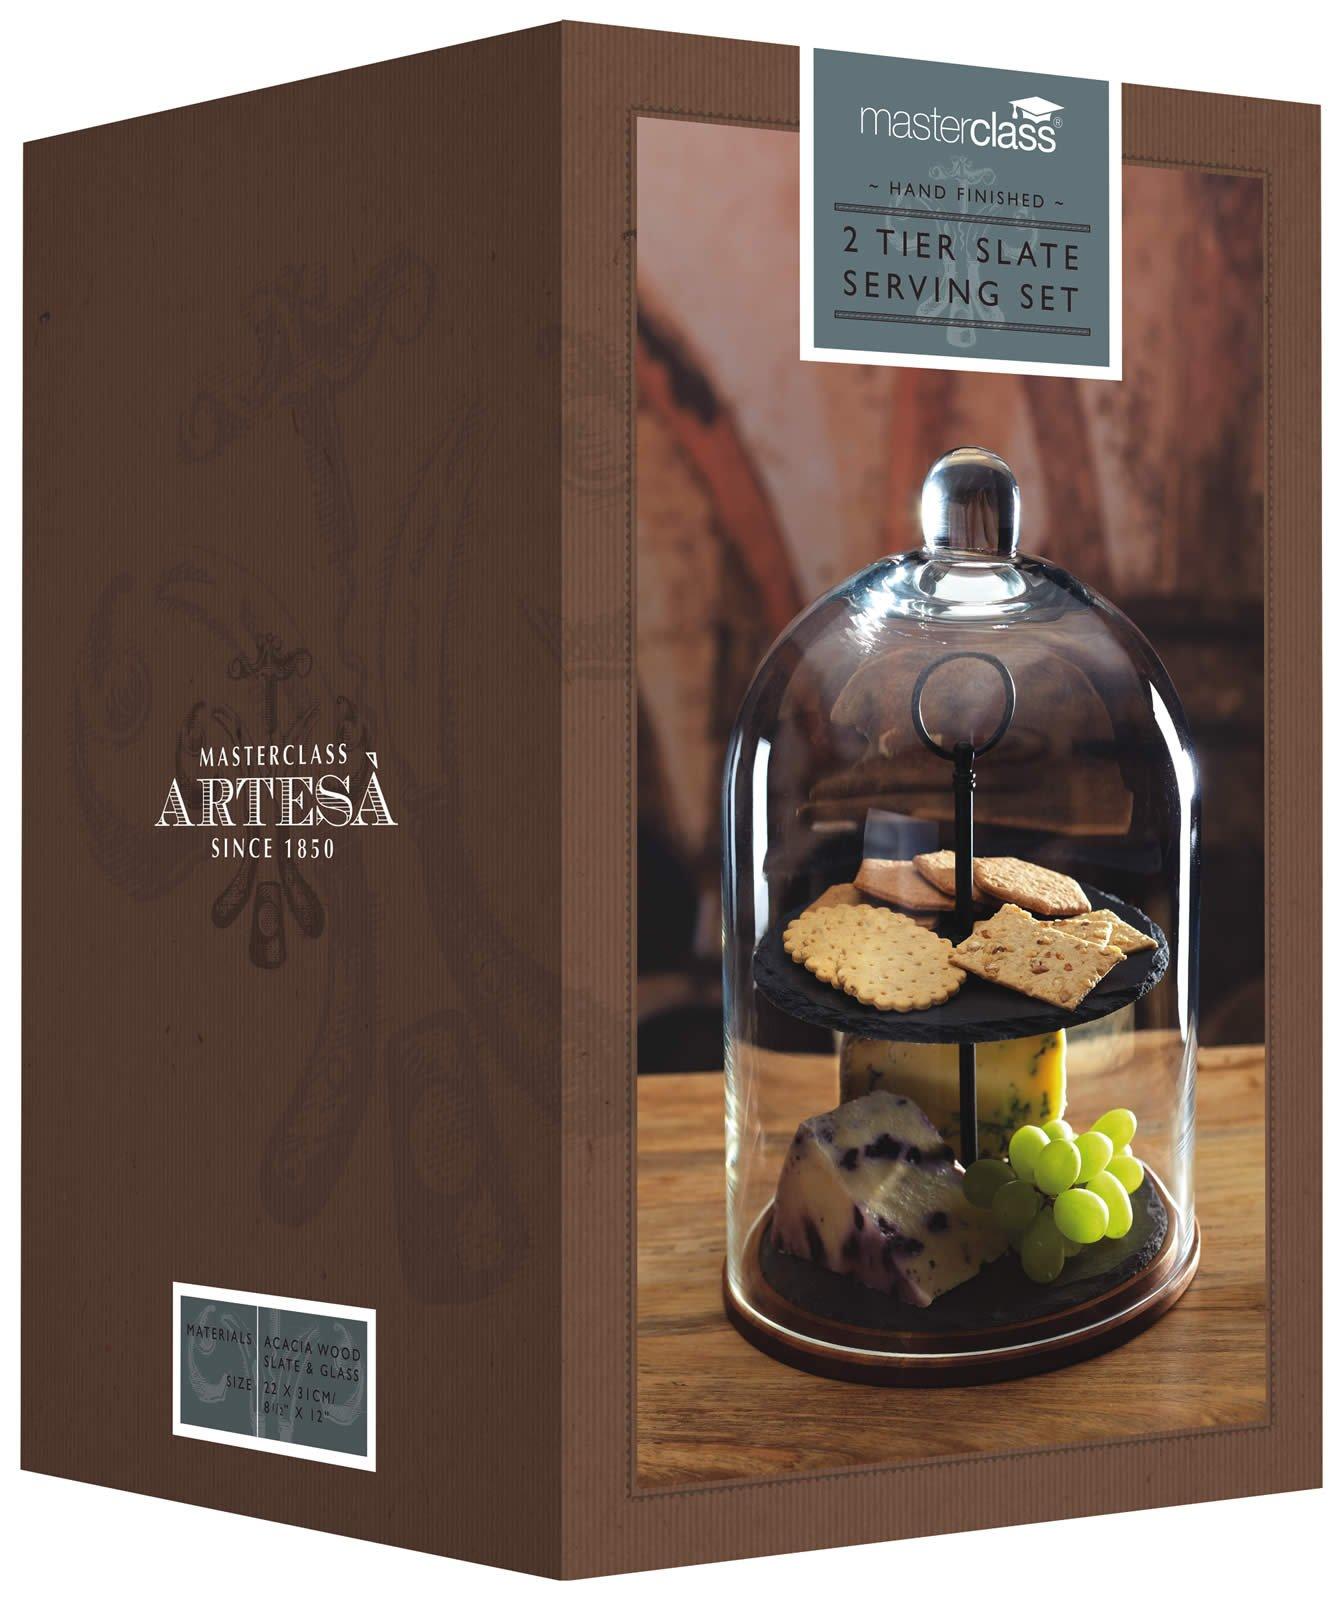 Masterclass Artesà 2-tier Serving Stand / Cake Dome, 22 x 31cm (8.5'' x 12'') by Artesa (Image #3)